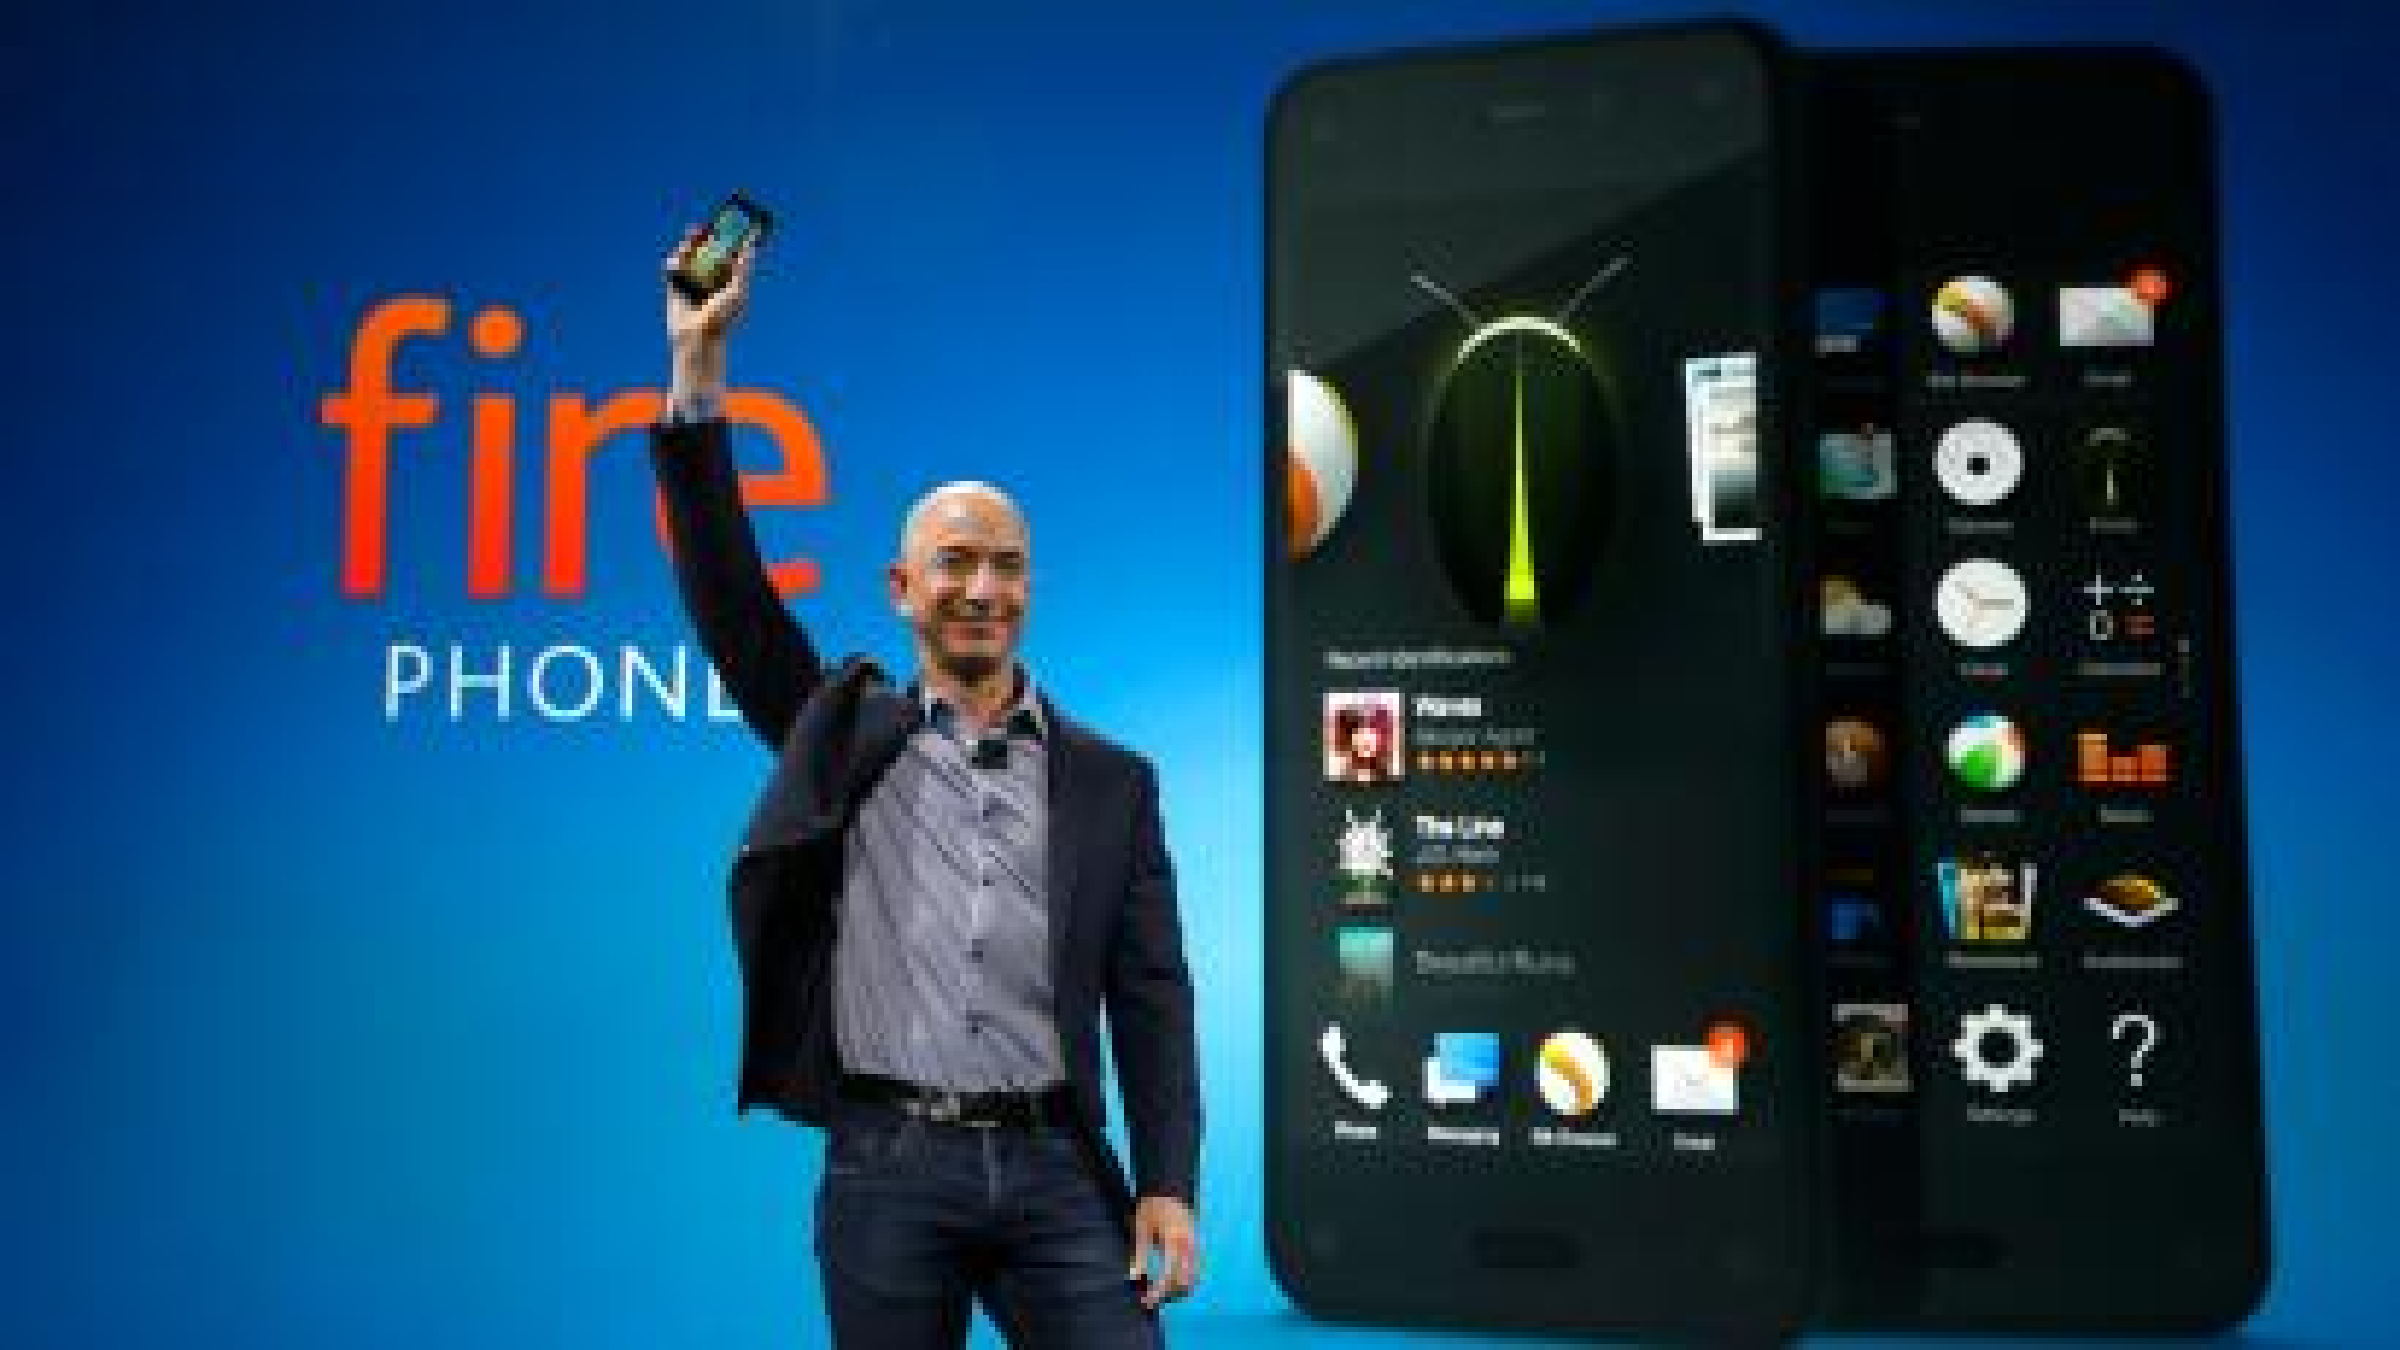 Amazon CEO Jeff Bezos unveils the Fire Phone